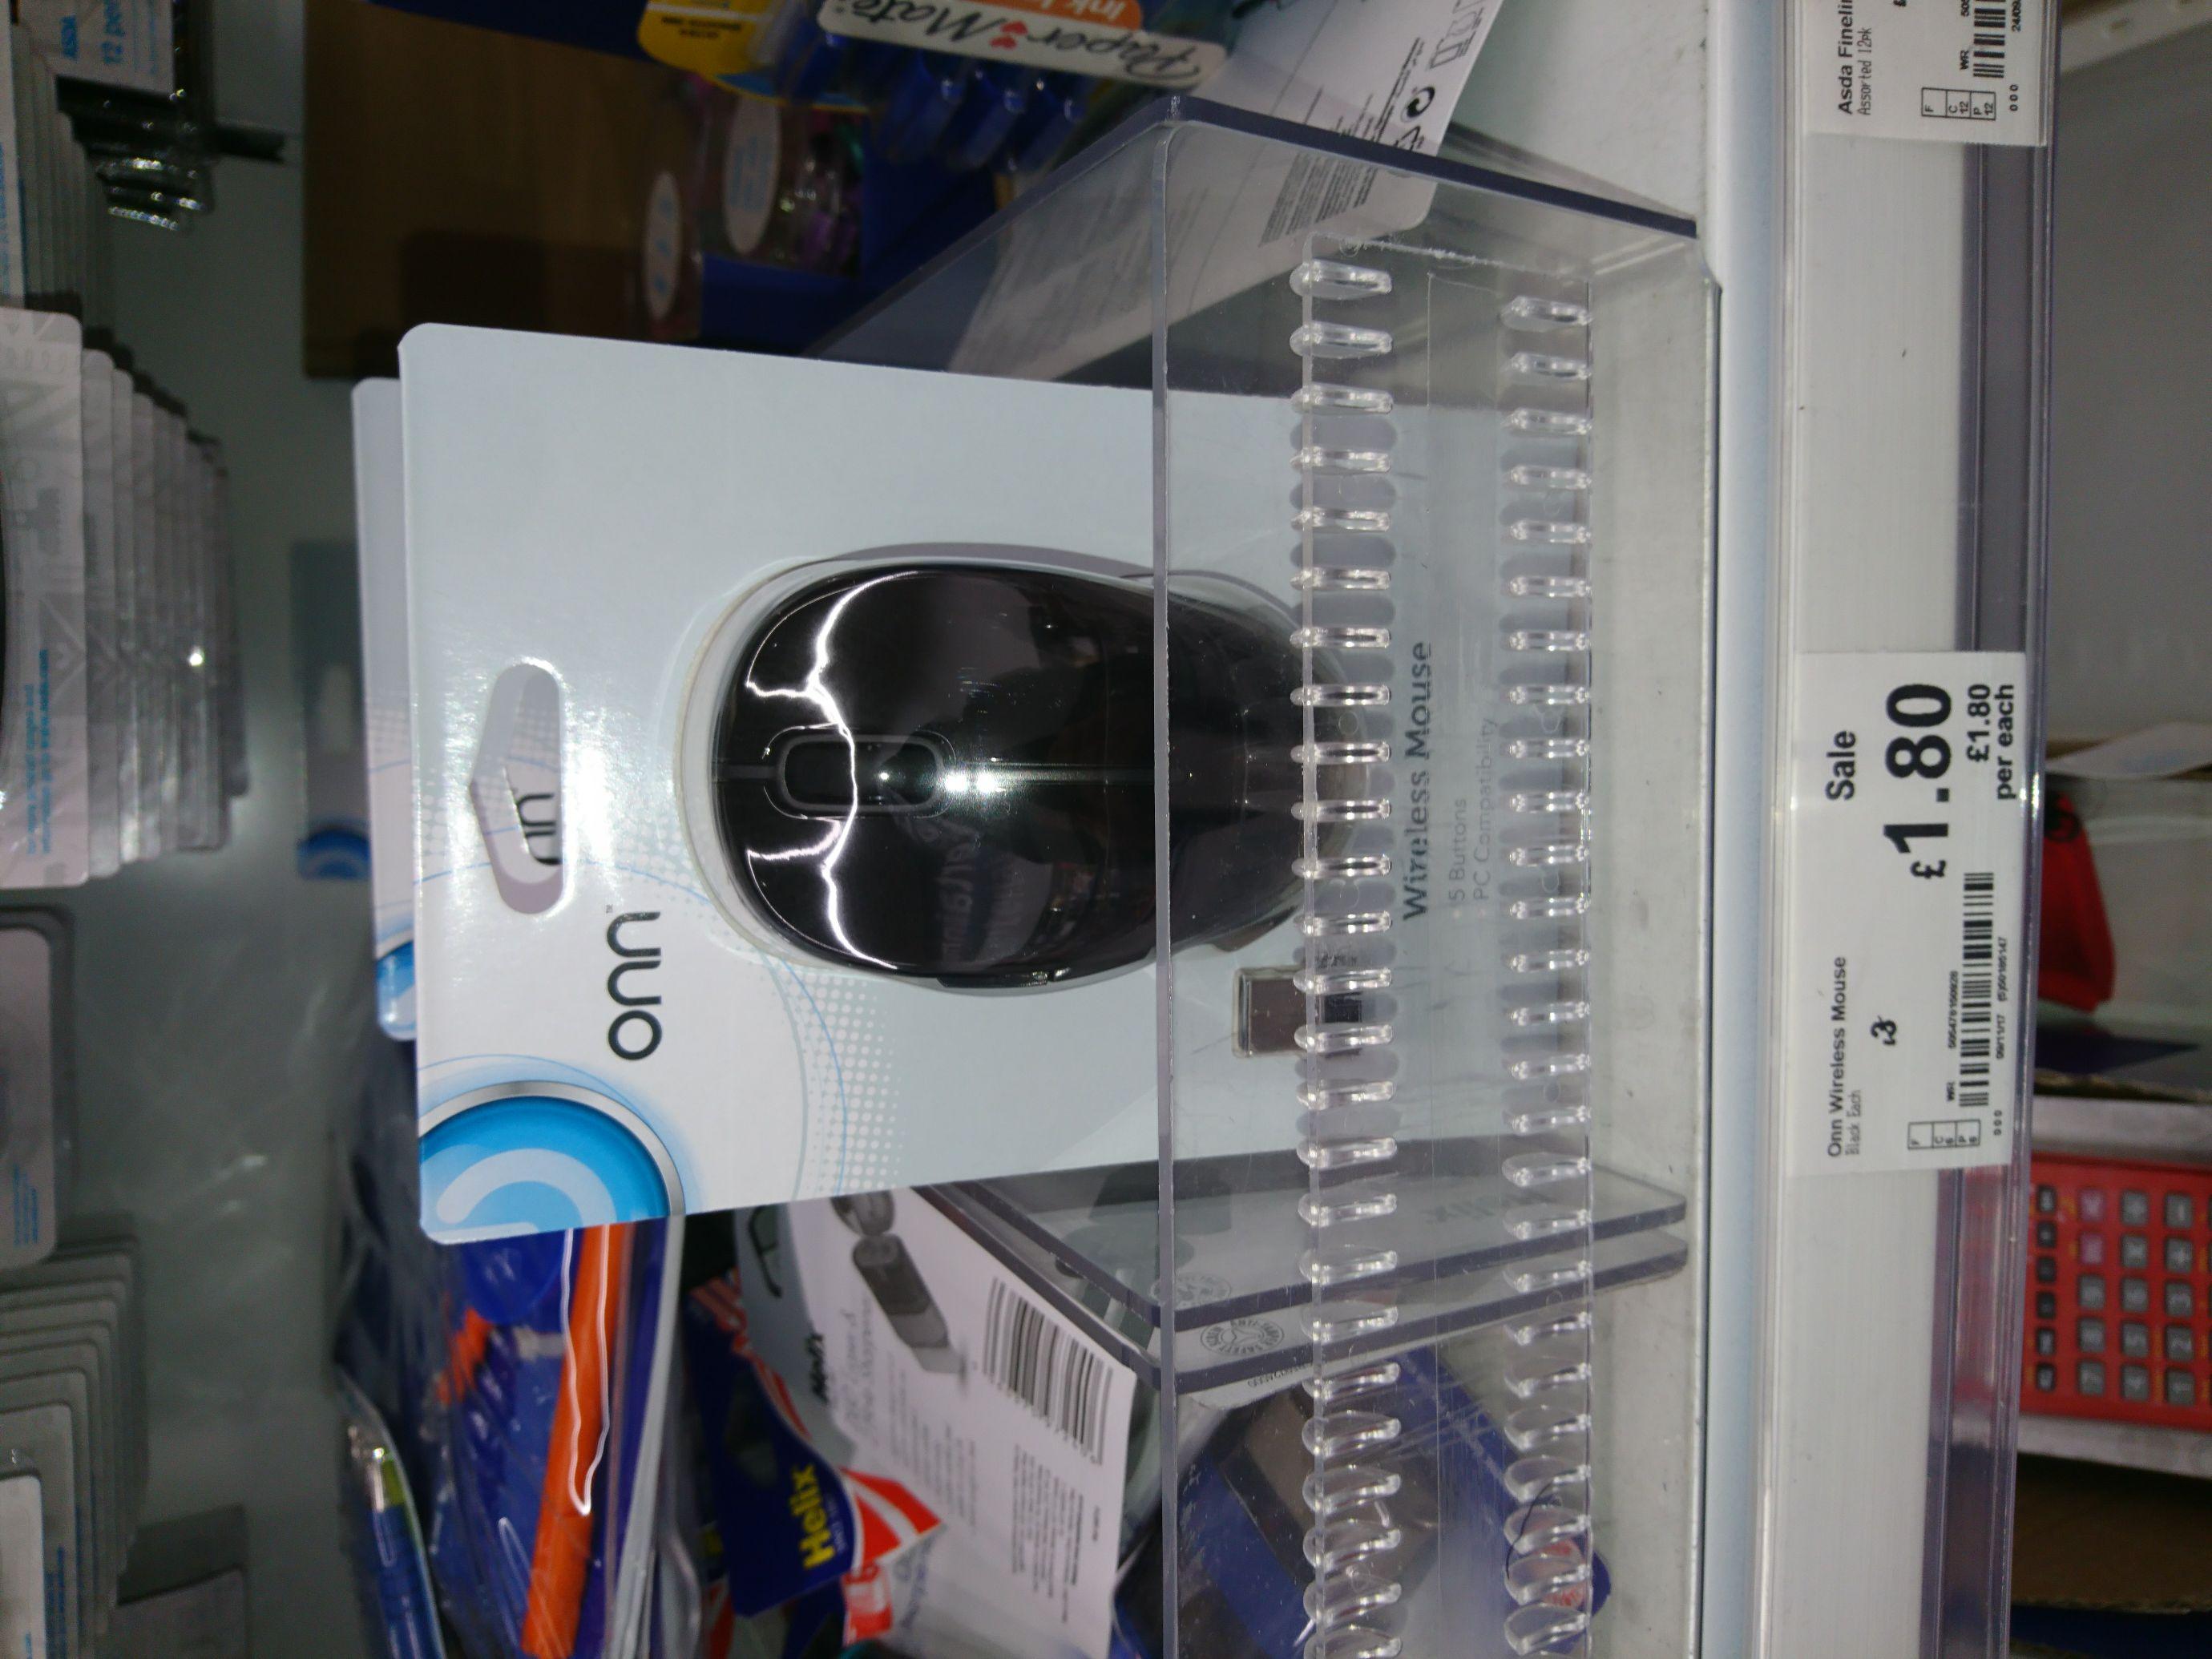 ONN 5 Button Wireless Mouse £1.80 instore @ Asda